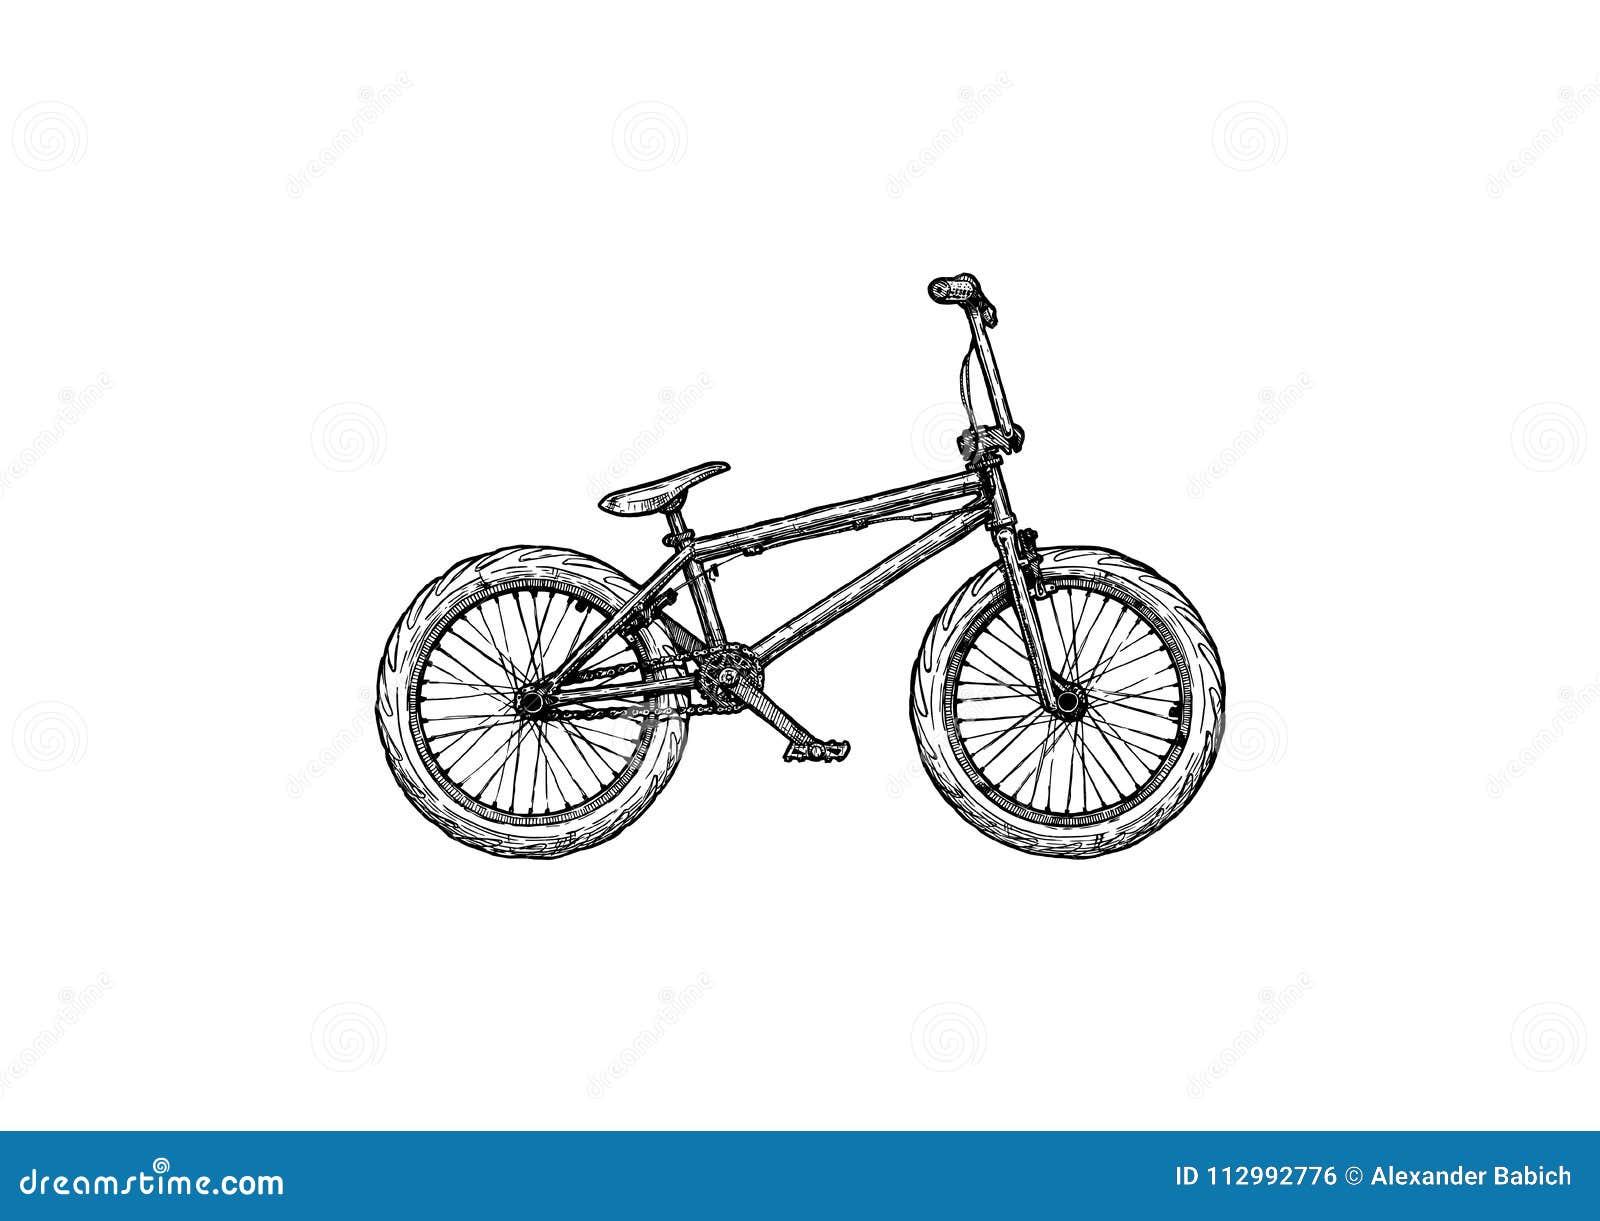 Illustration of BMX bike